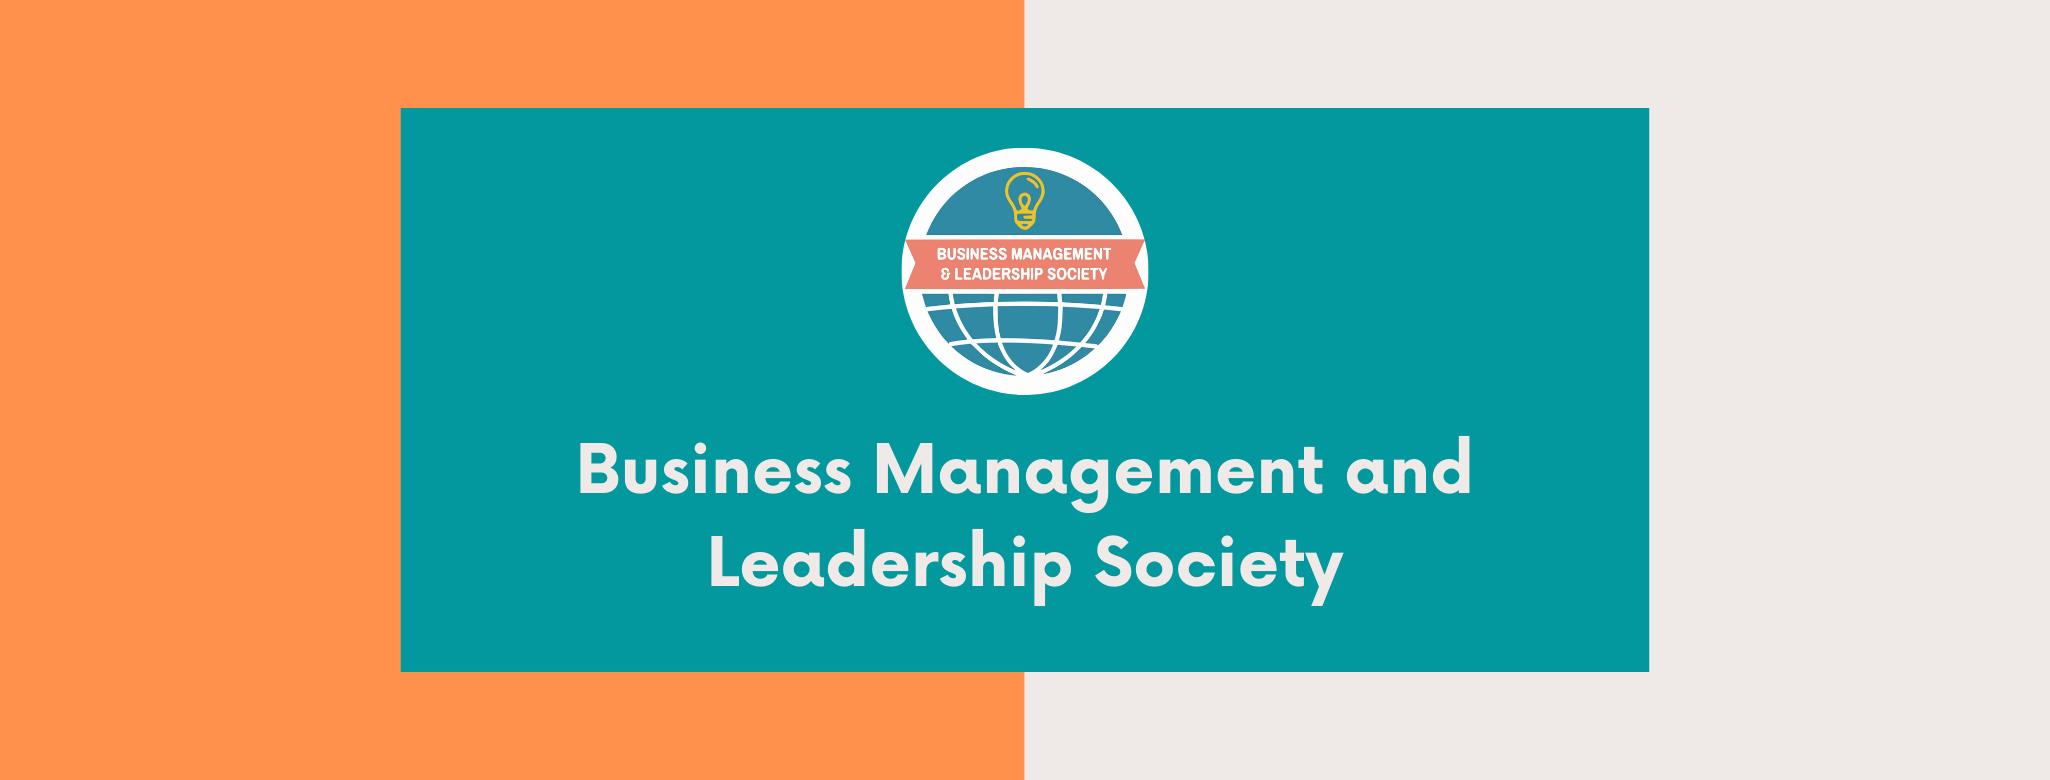 Business Management and Leadership Society thumbnail